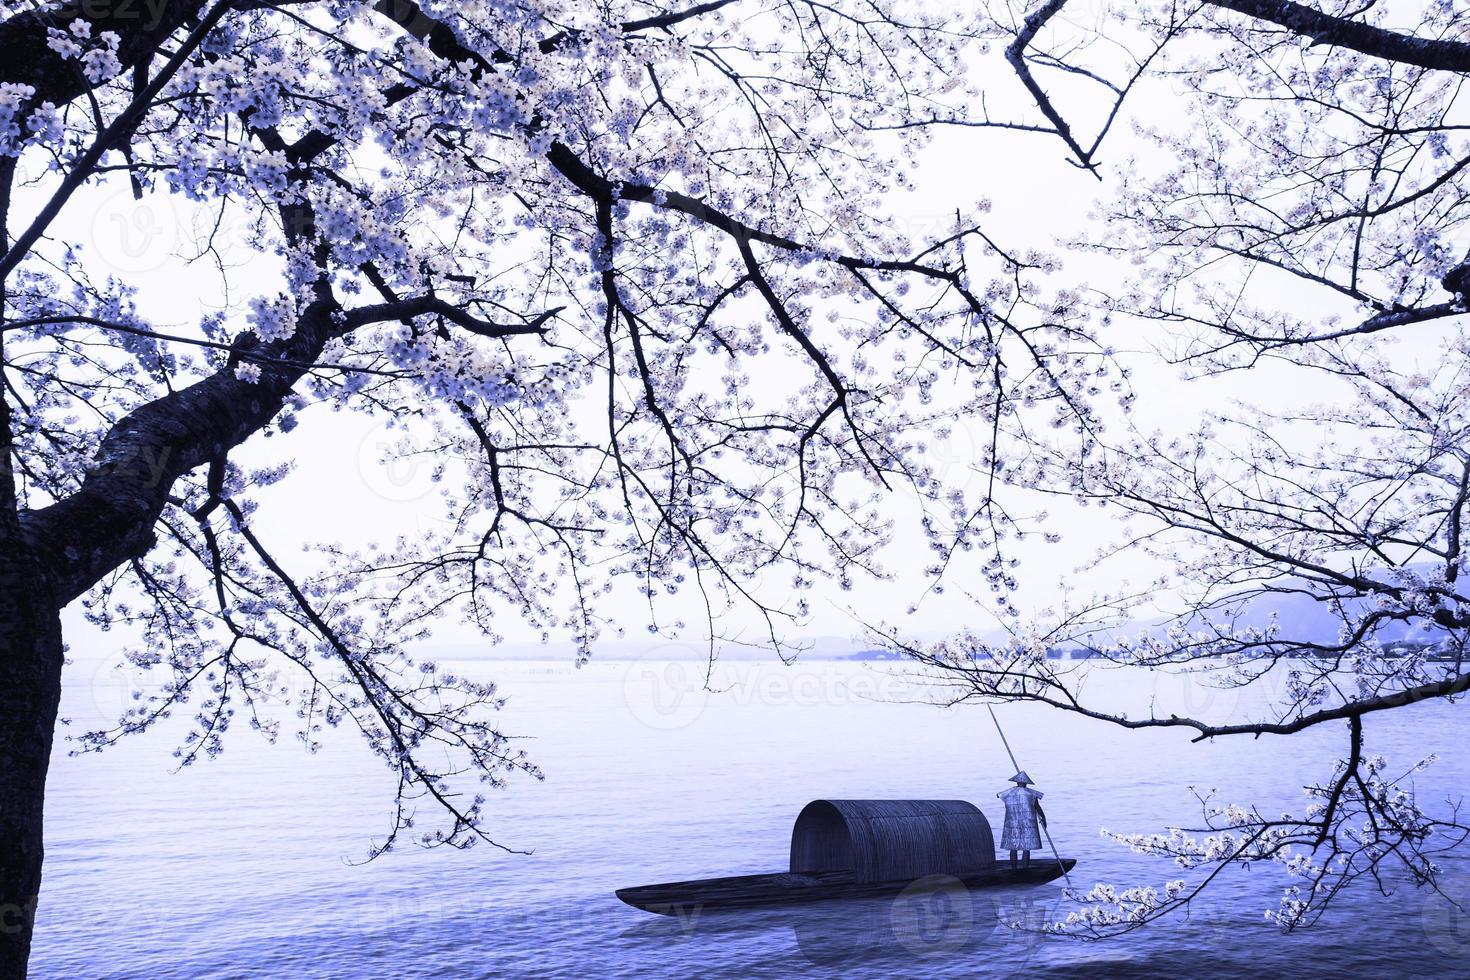 sakura säsong i kaizu osaki, japan foto